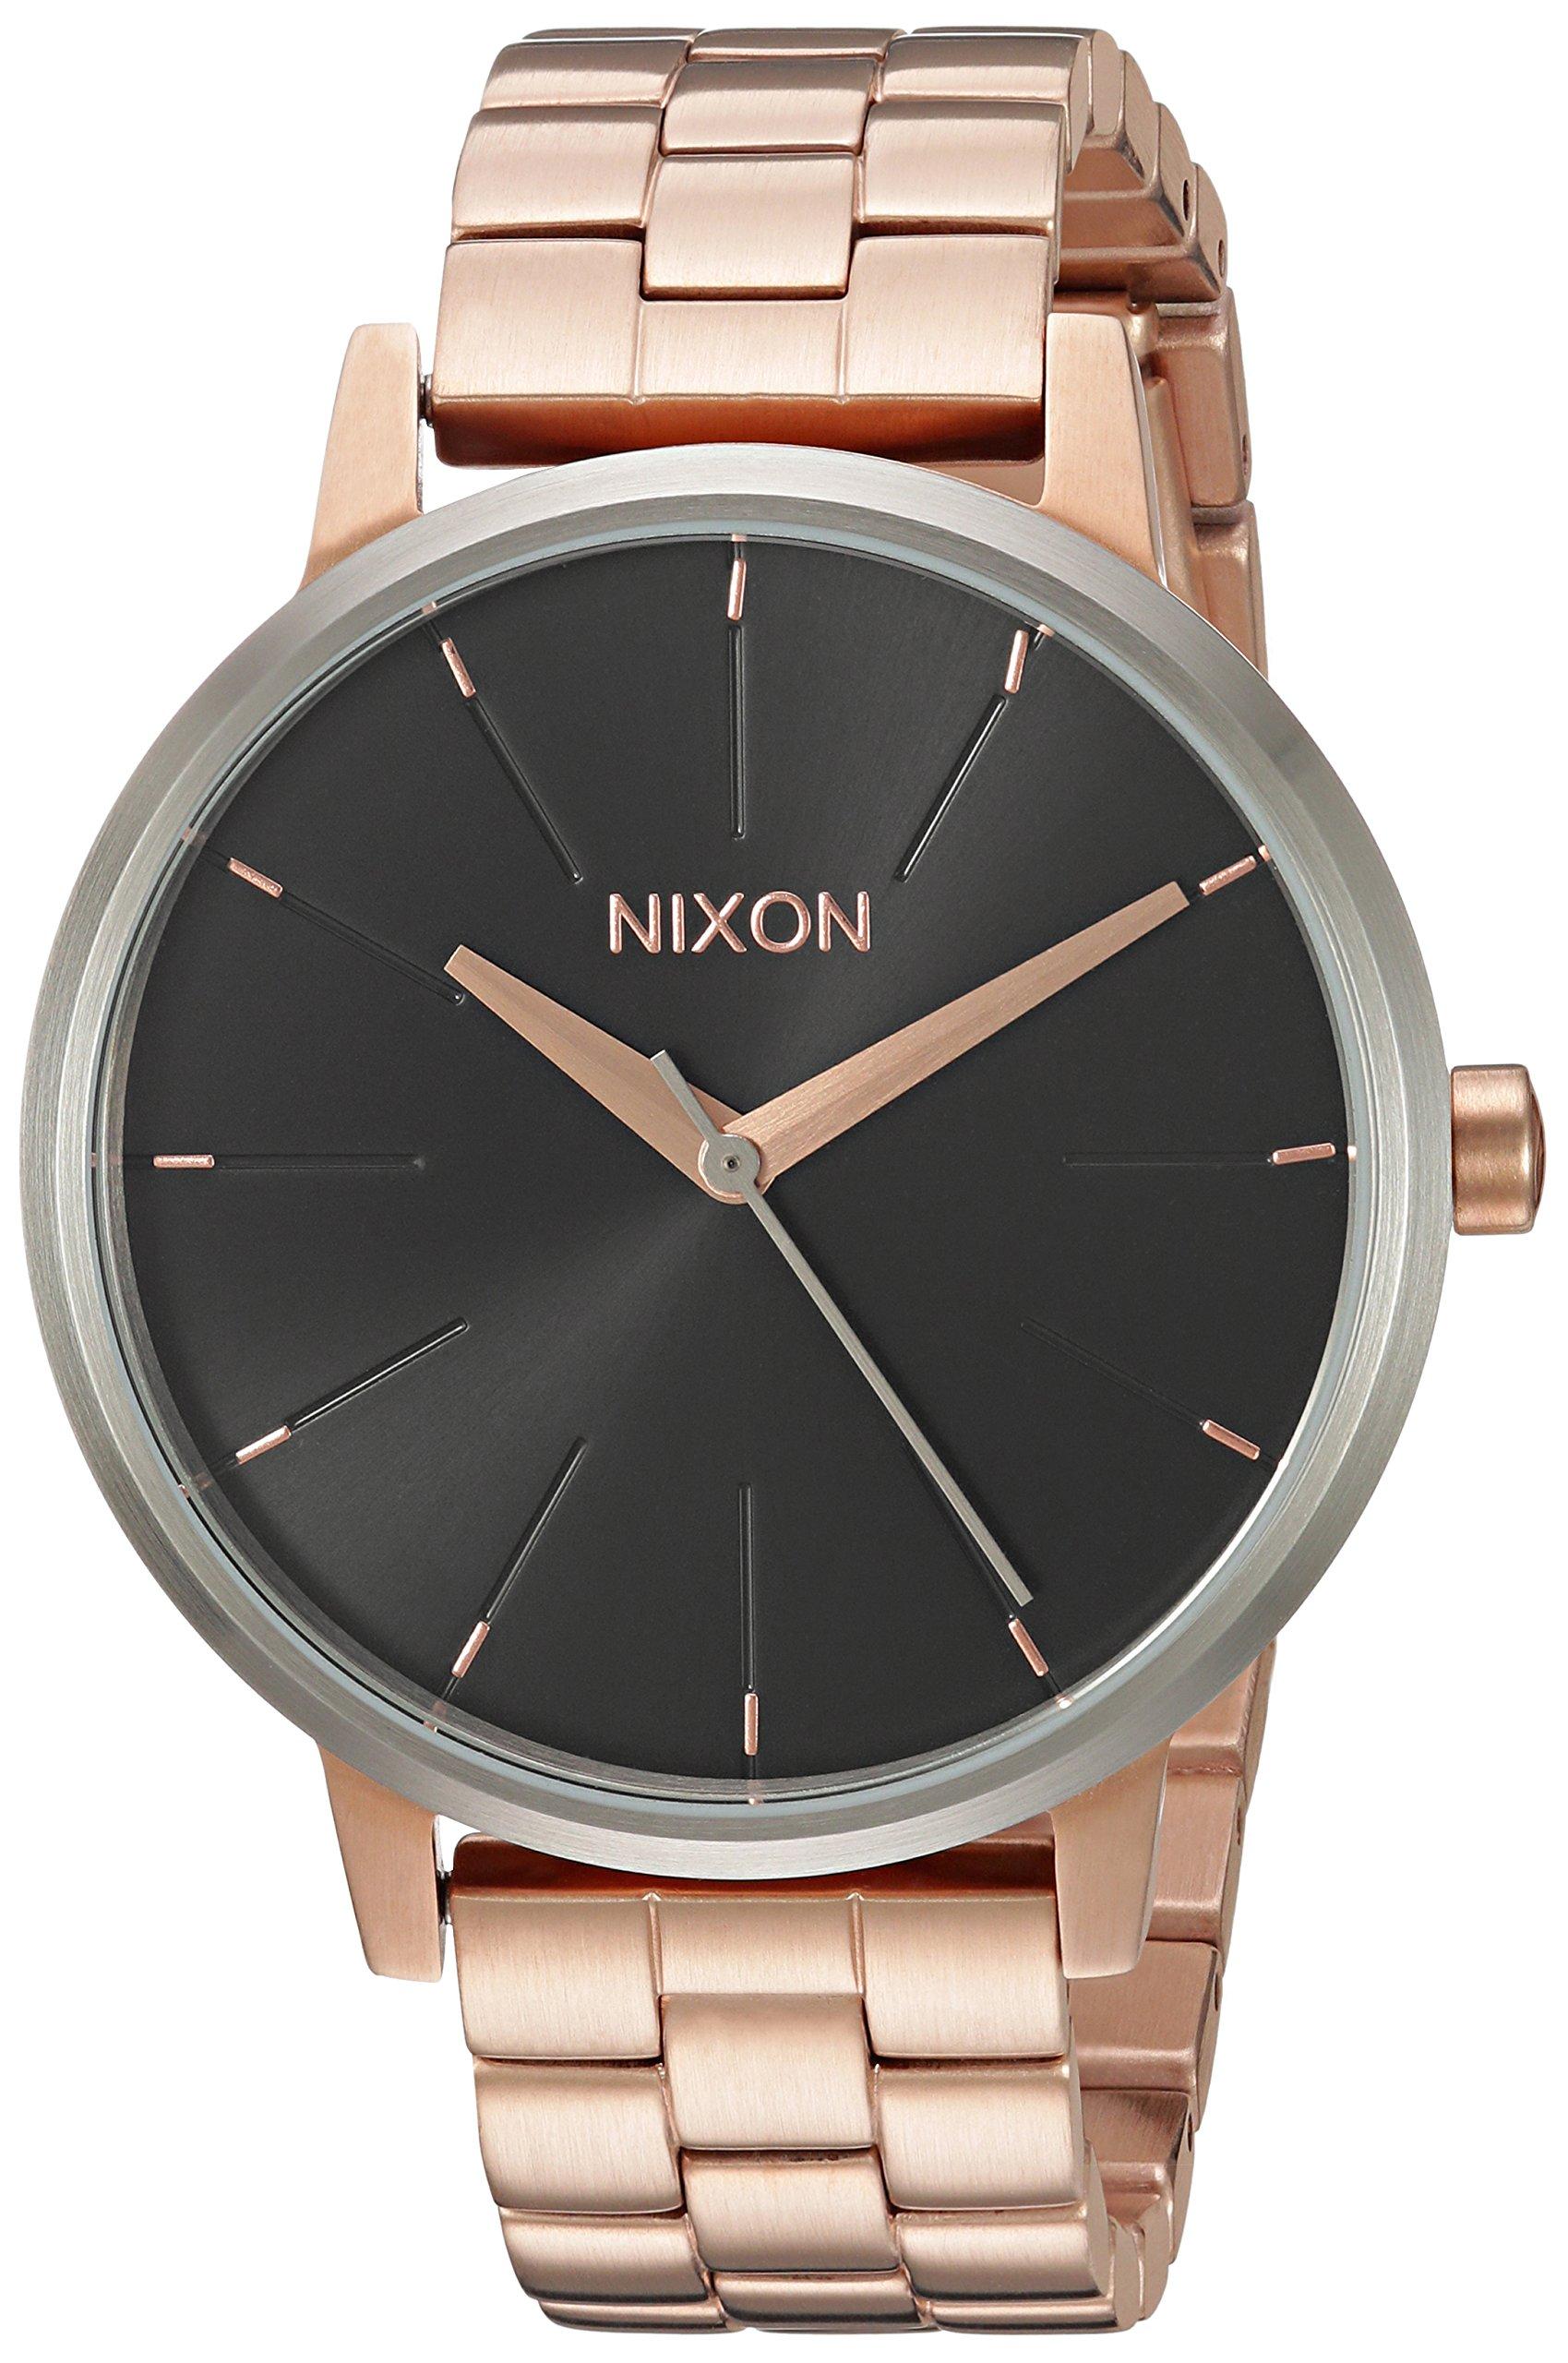 Nixon Women's 'Kensington' Quartz Stainless Steel Watch, Color:Rose Gold-Toned (Model: A0992361-00) by NIXON (Image #1)